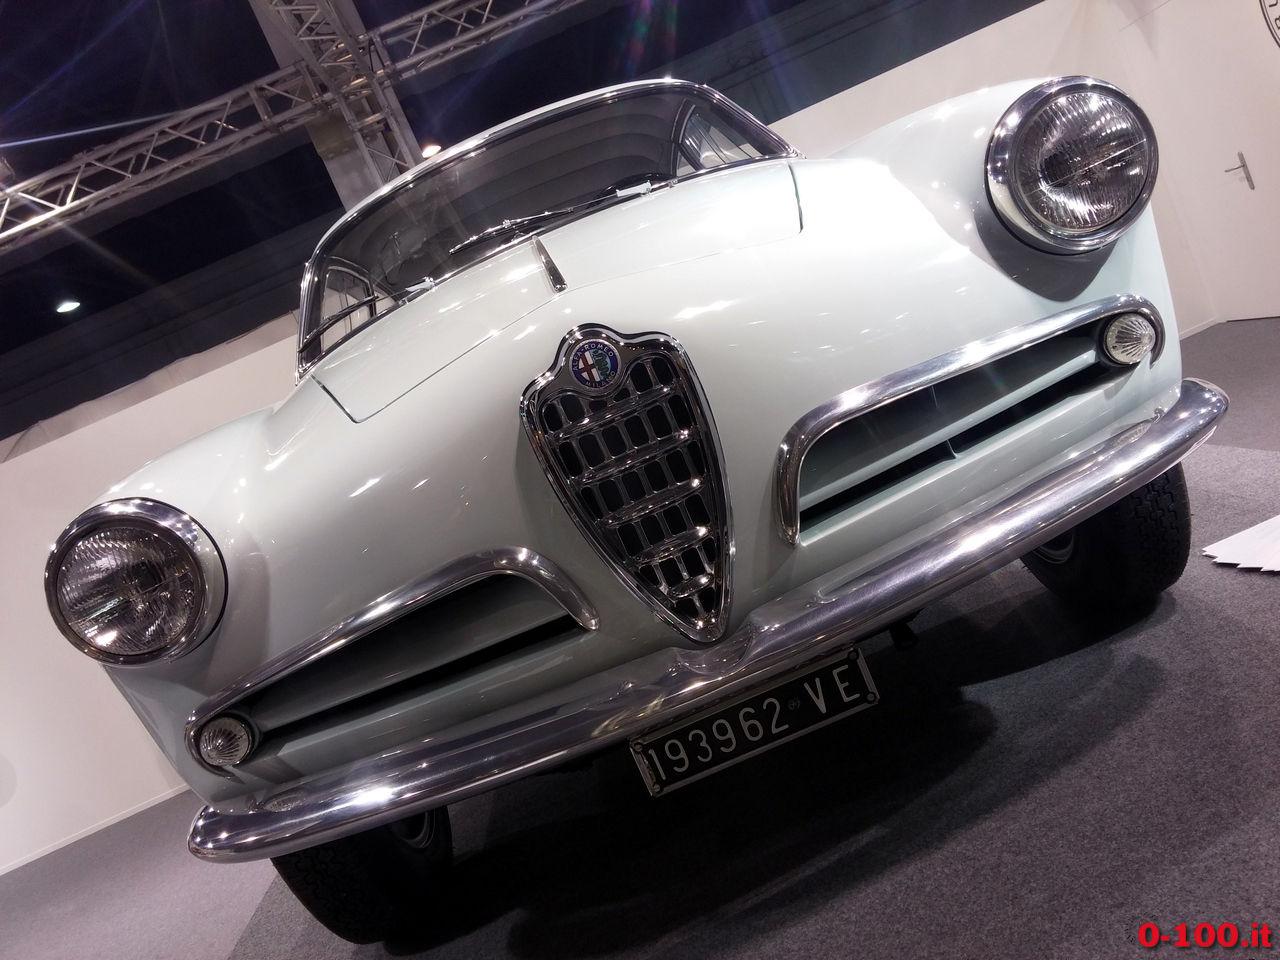 automotodepoca-2016-alfa-romeo-car-market-mercato-auto-prezzo-price_0-10011